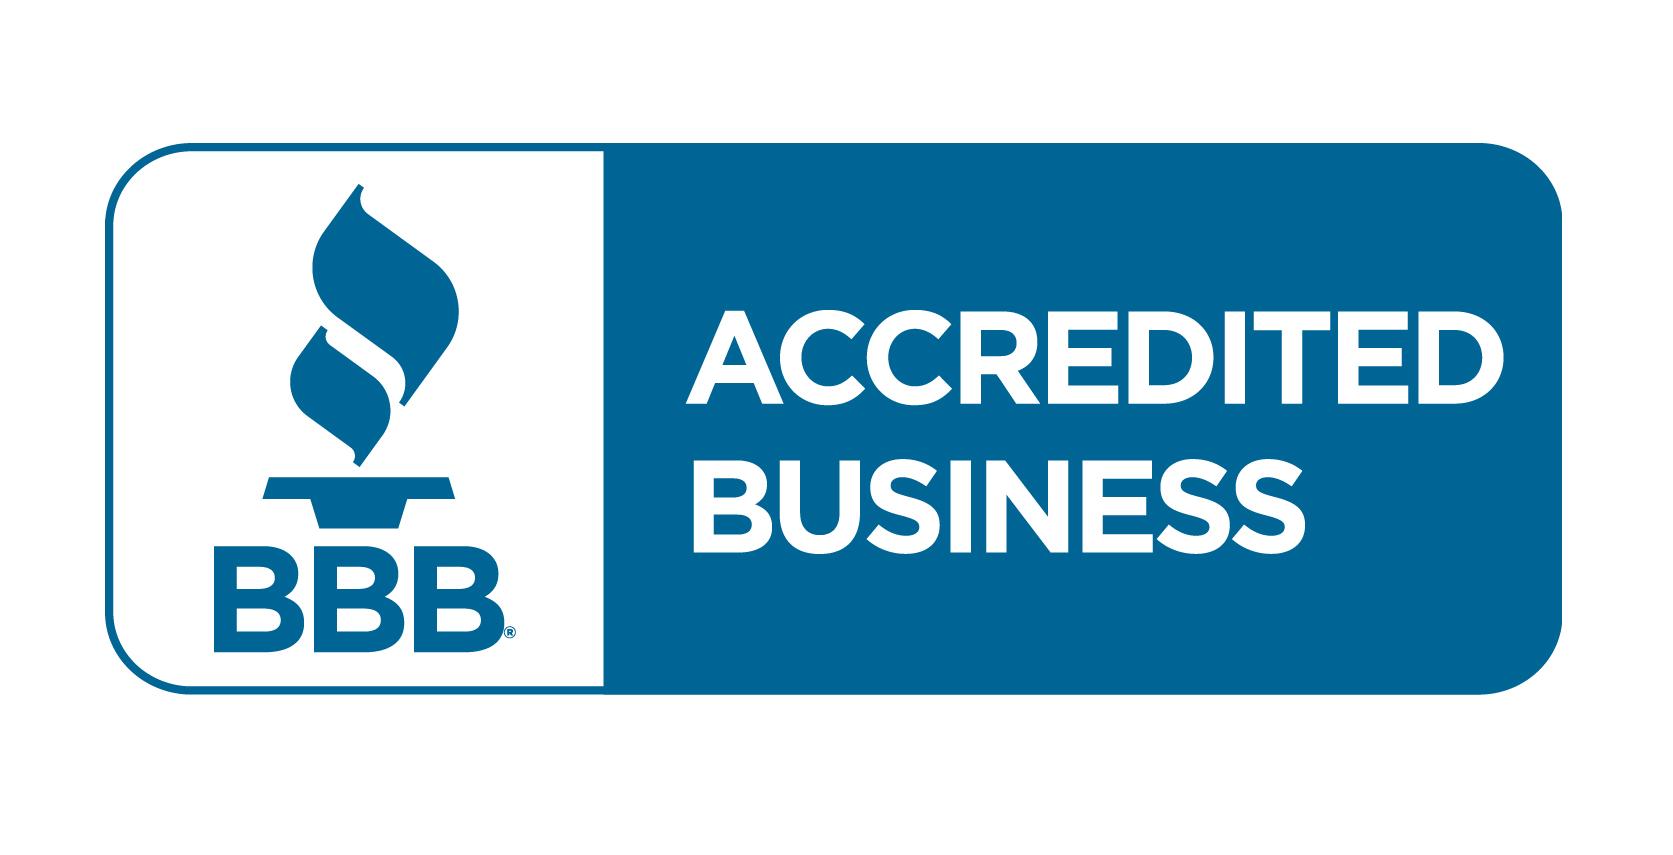 Better Business Bureau - Accredited Business badge